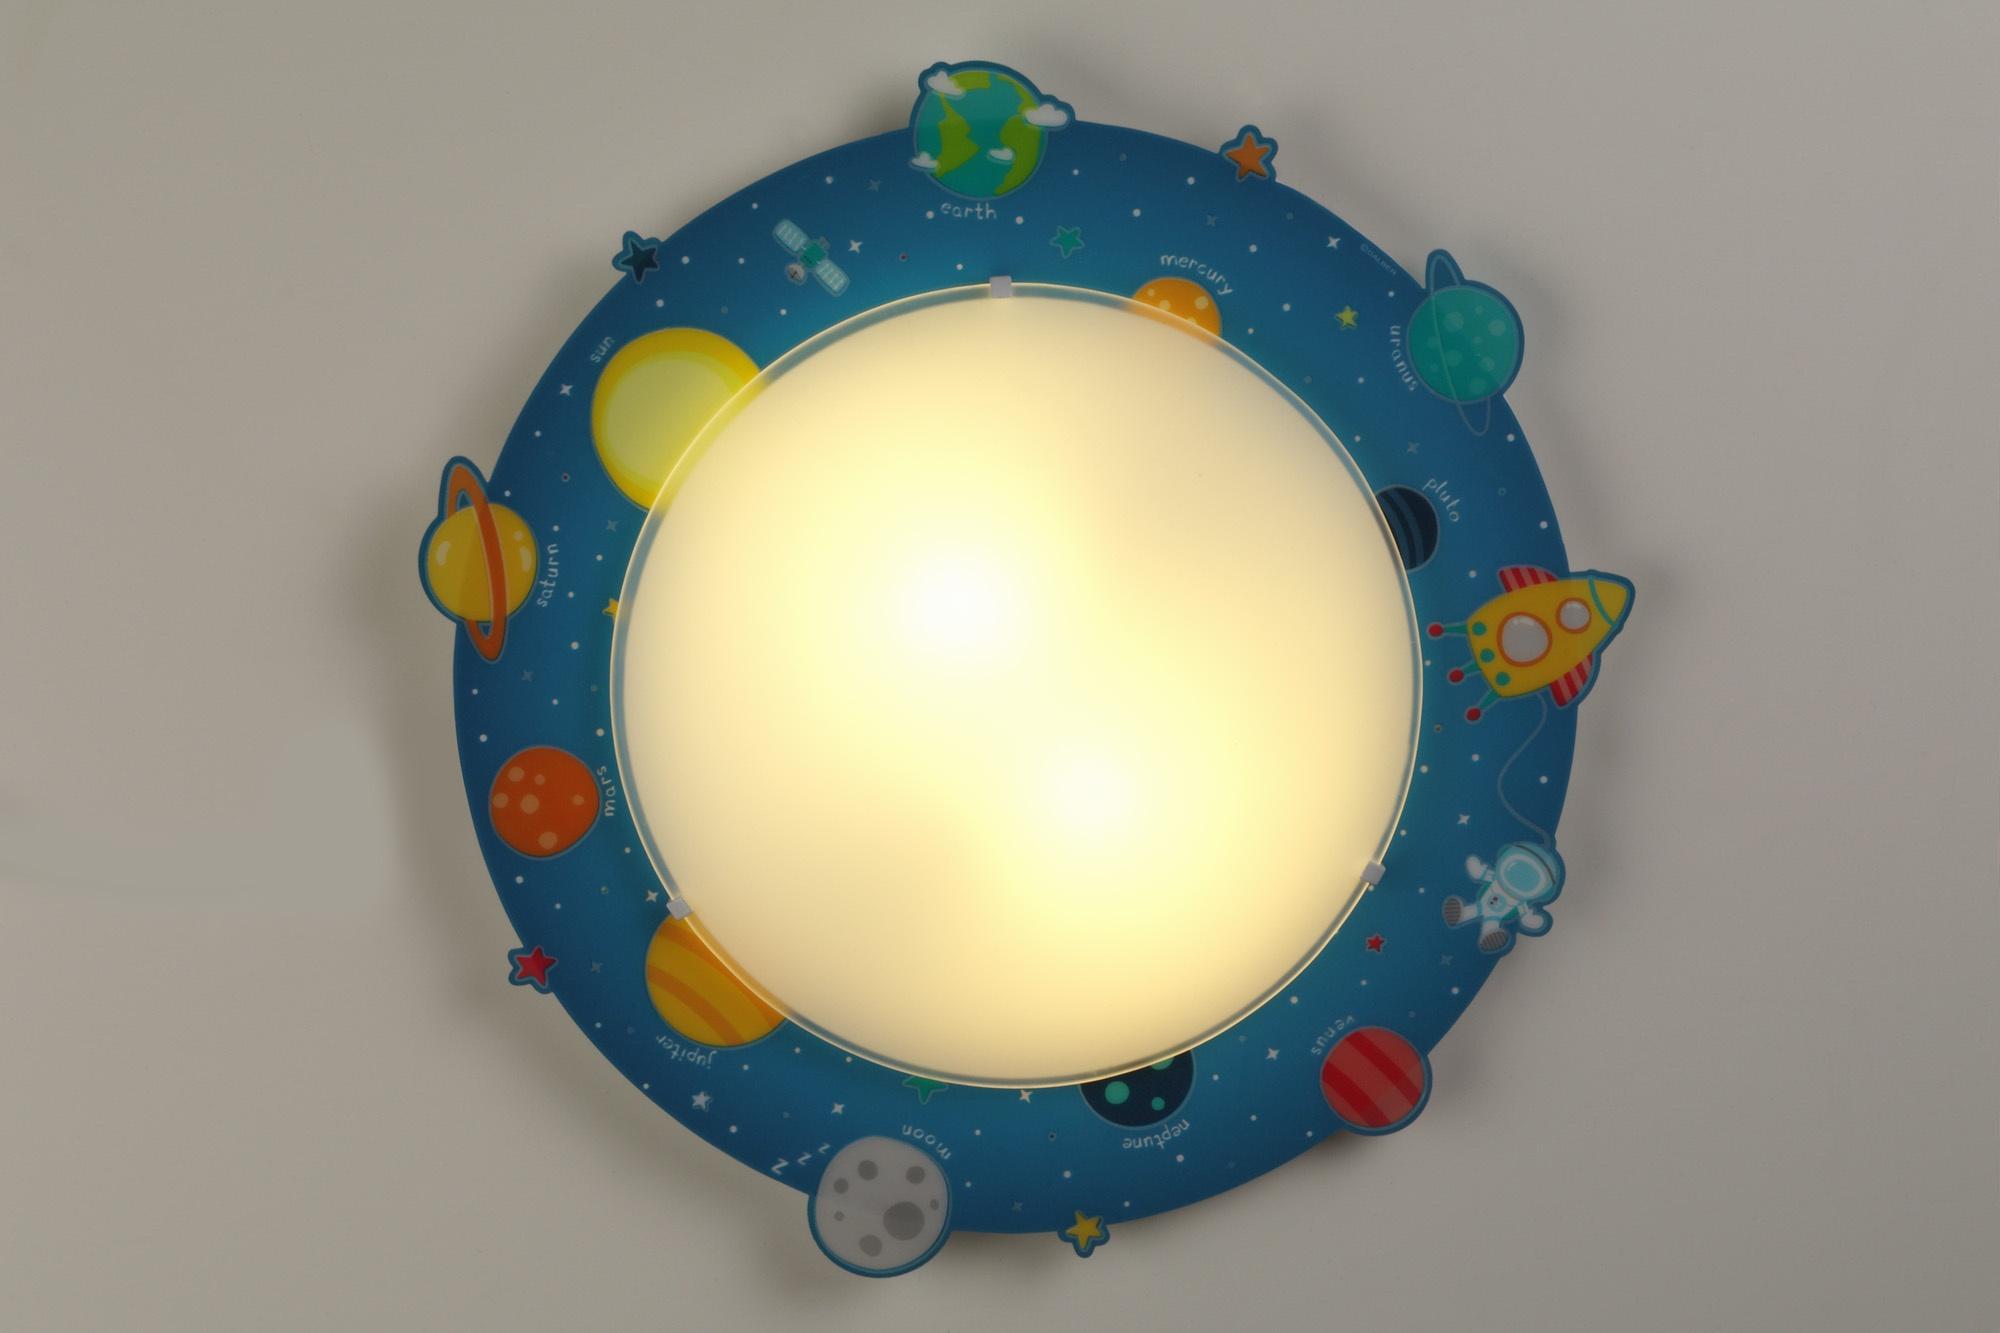 Plafonniere Blue : Dalber plafonnière 2 in 1 planets glow 43 cm blue internet toys